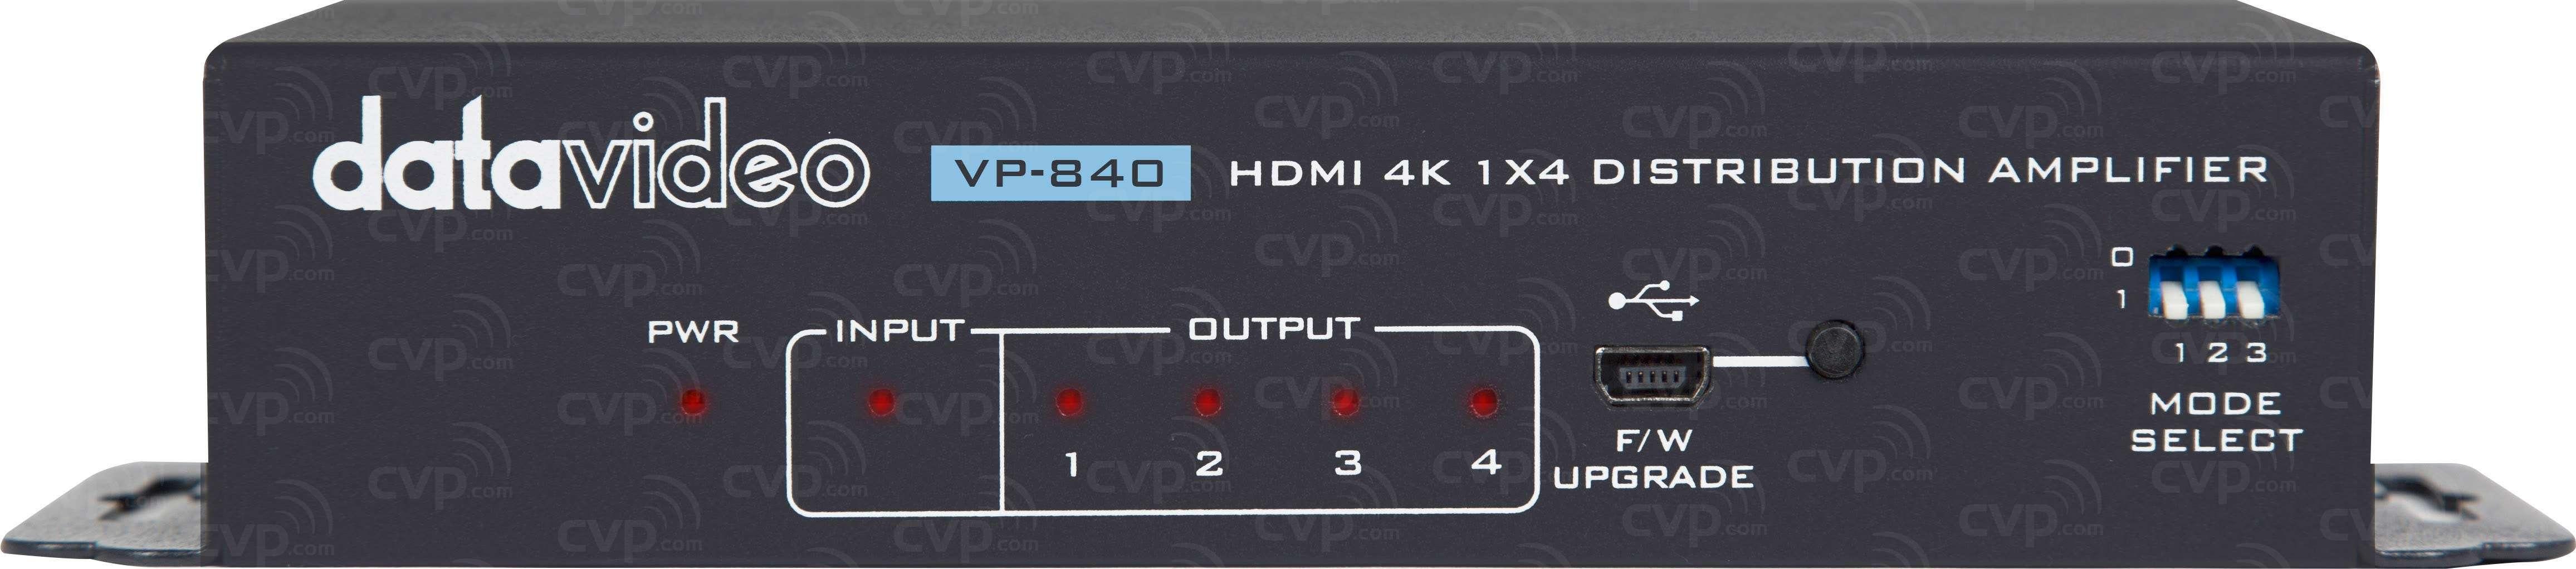 Datavideo DATA-VP840 (DATAVP840) VP-840 4K HDMI Distribution Amplifier 1x4